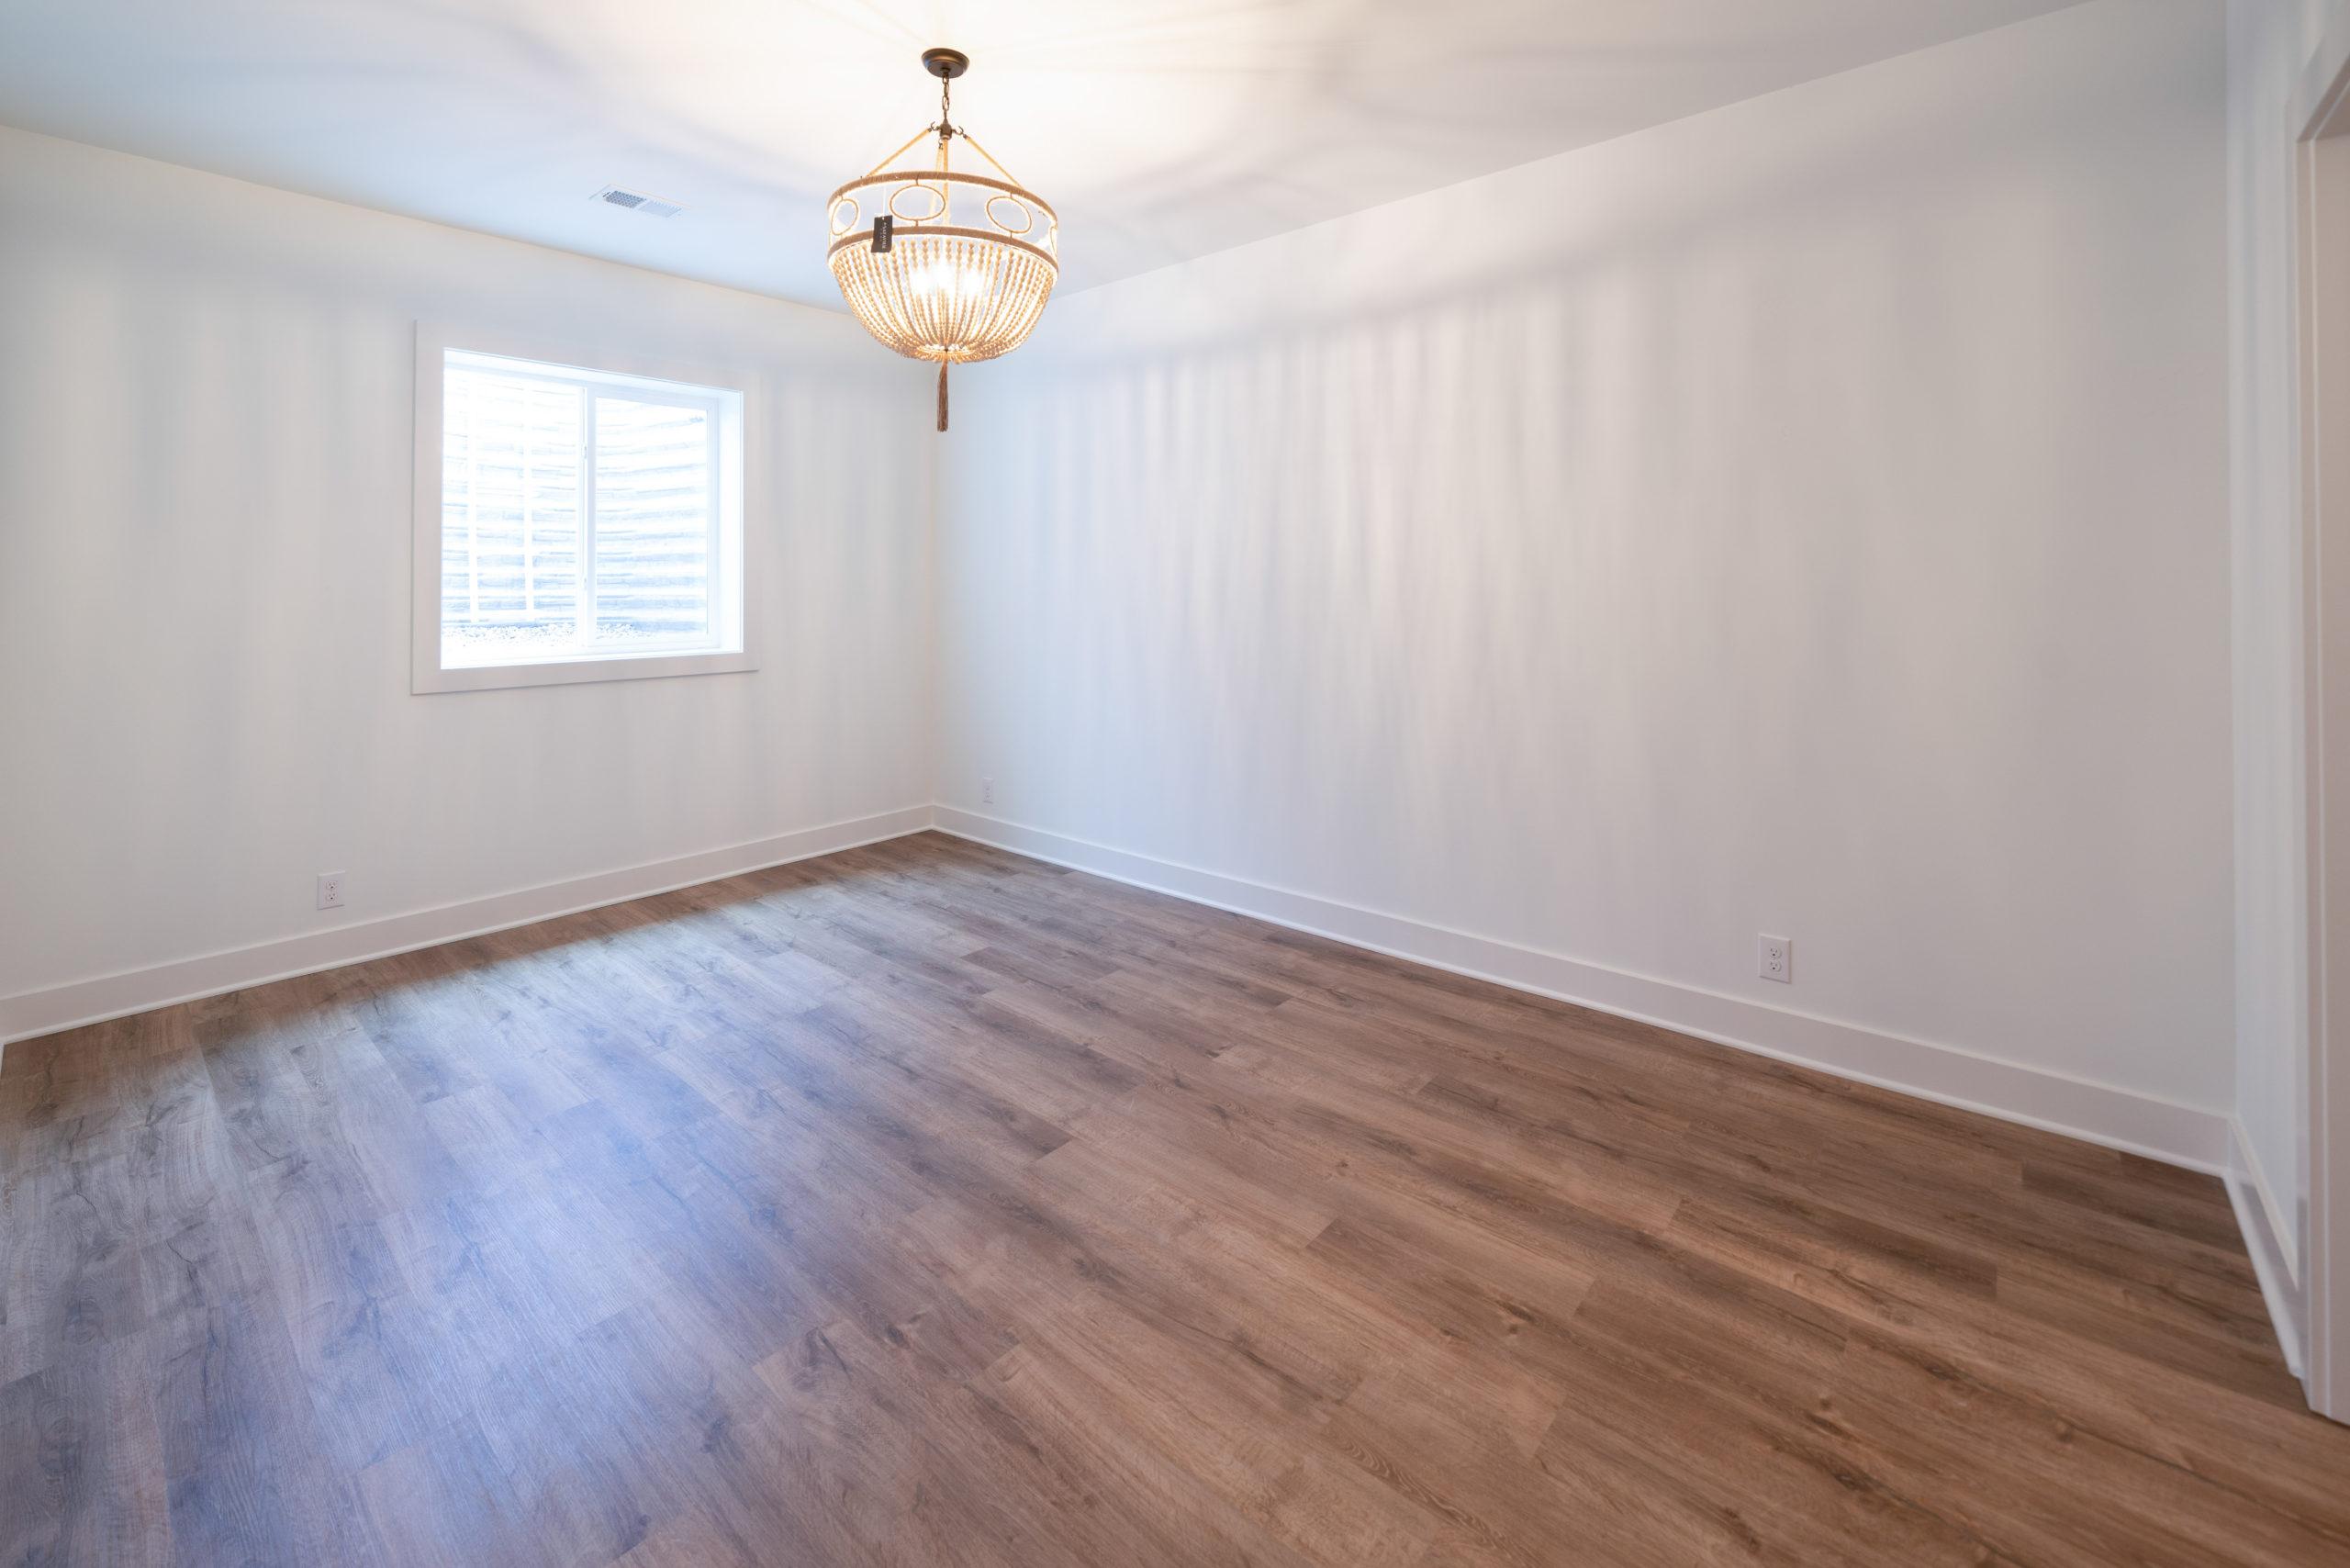 downstairs bedroom with hardwood flooring